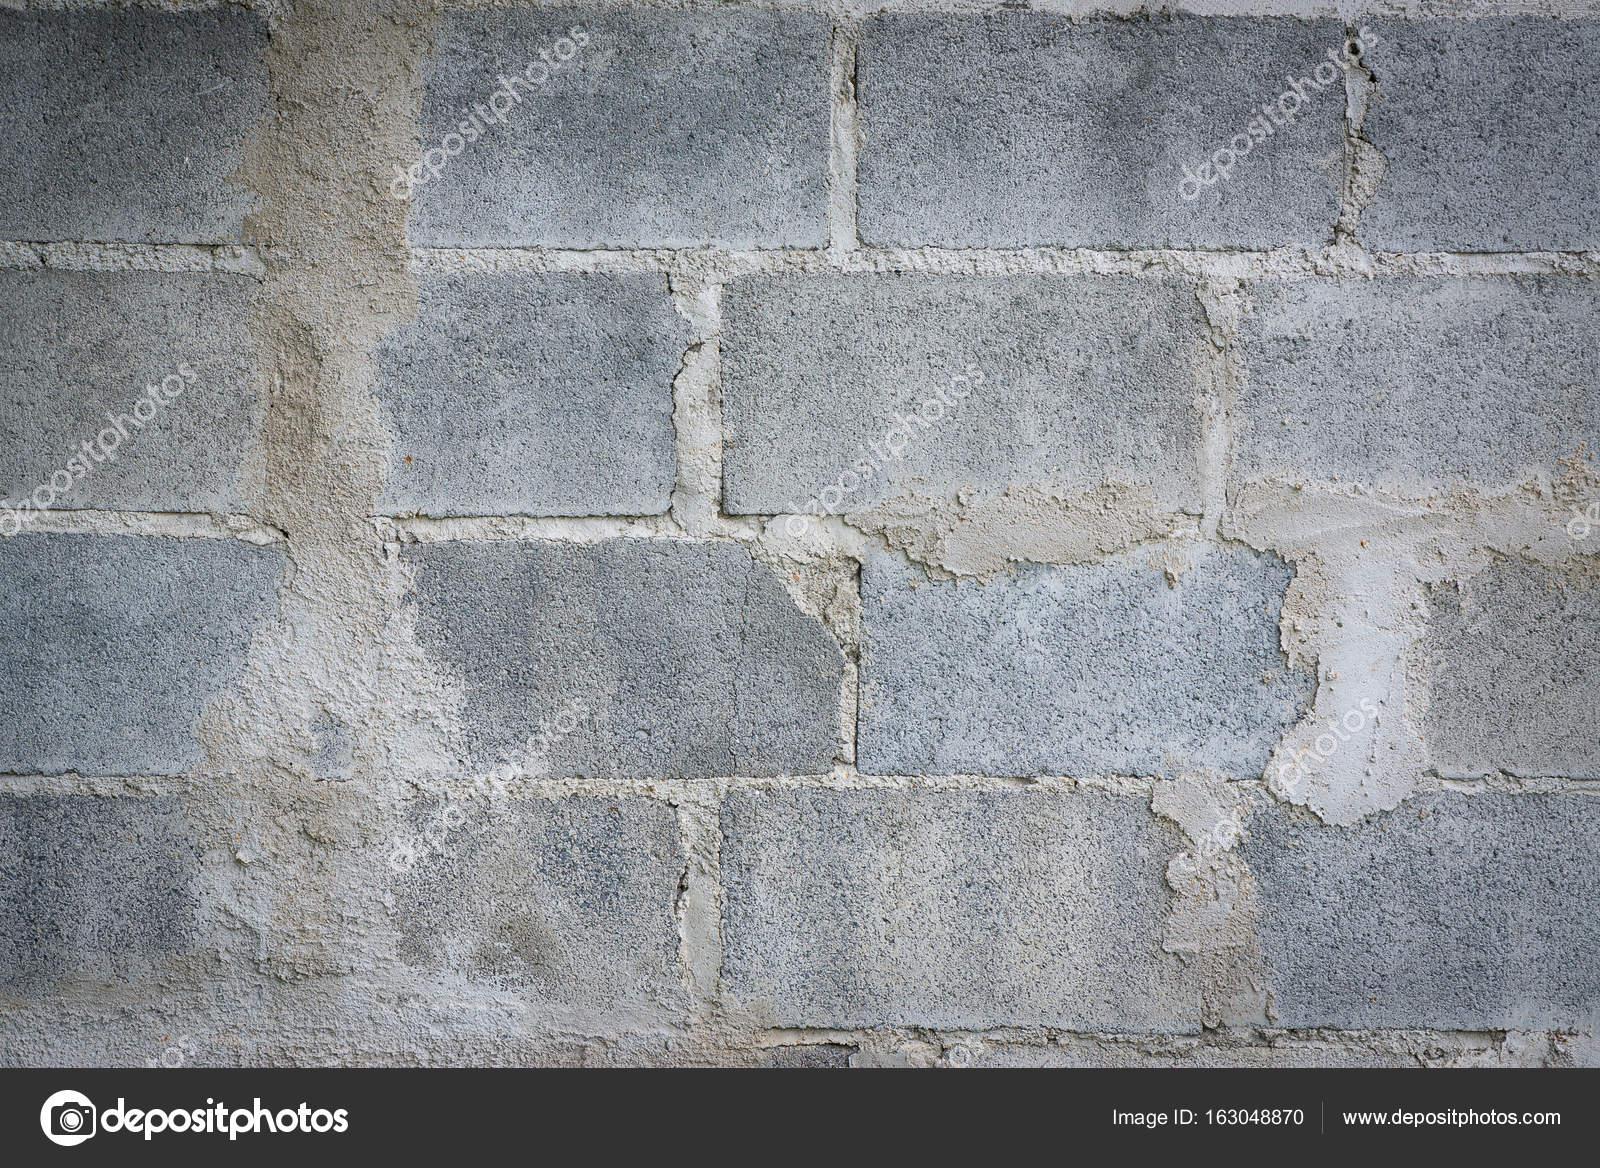 Stenen Muur Verven : Oude verf peeling baksteen muur grunge en vuil achtergrond